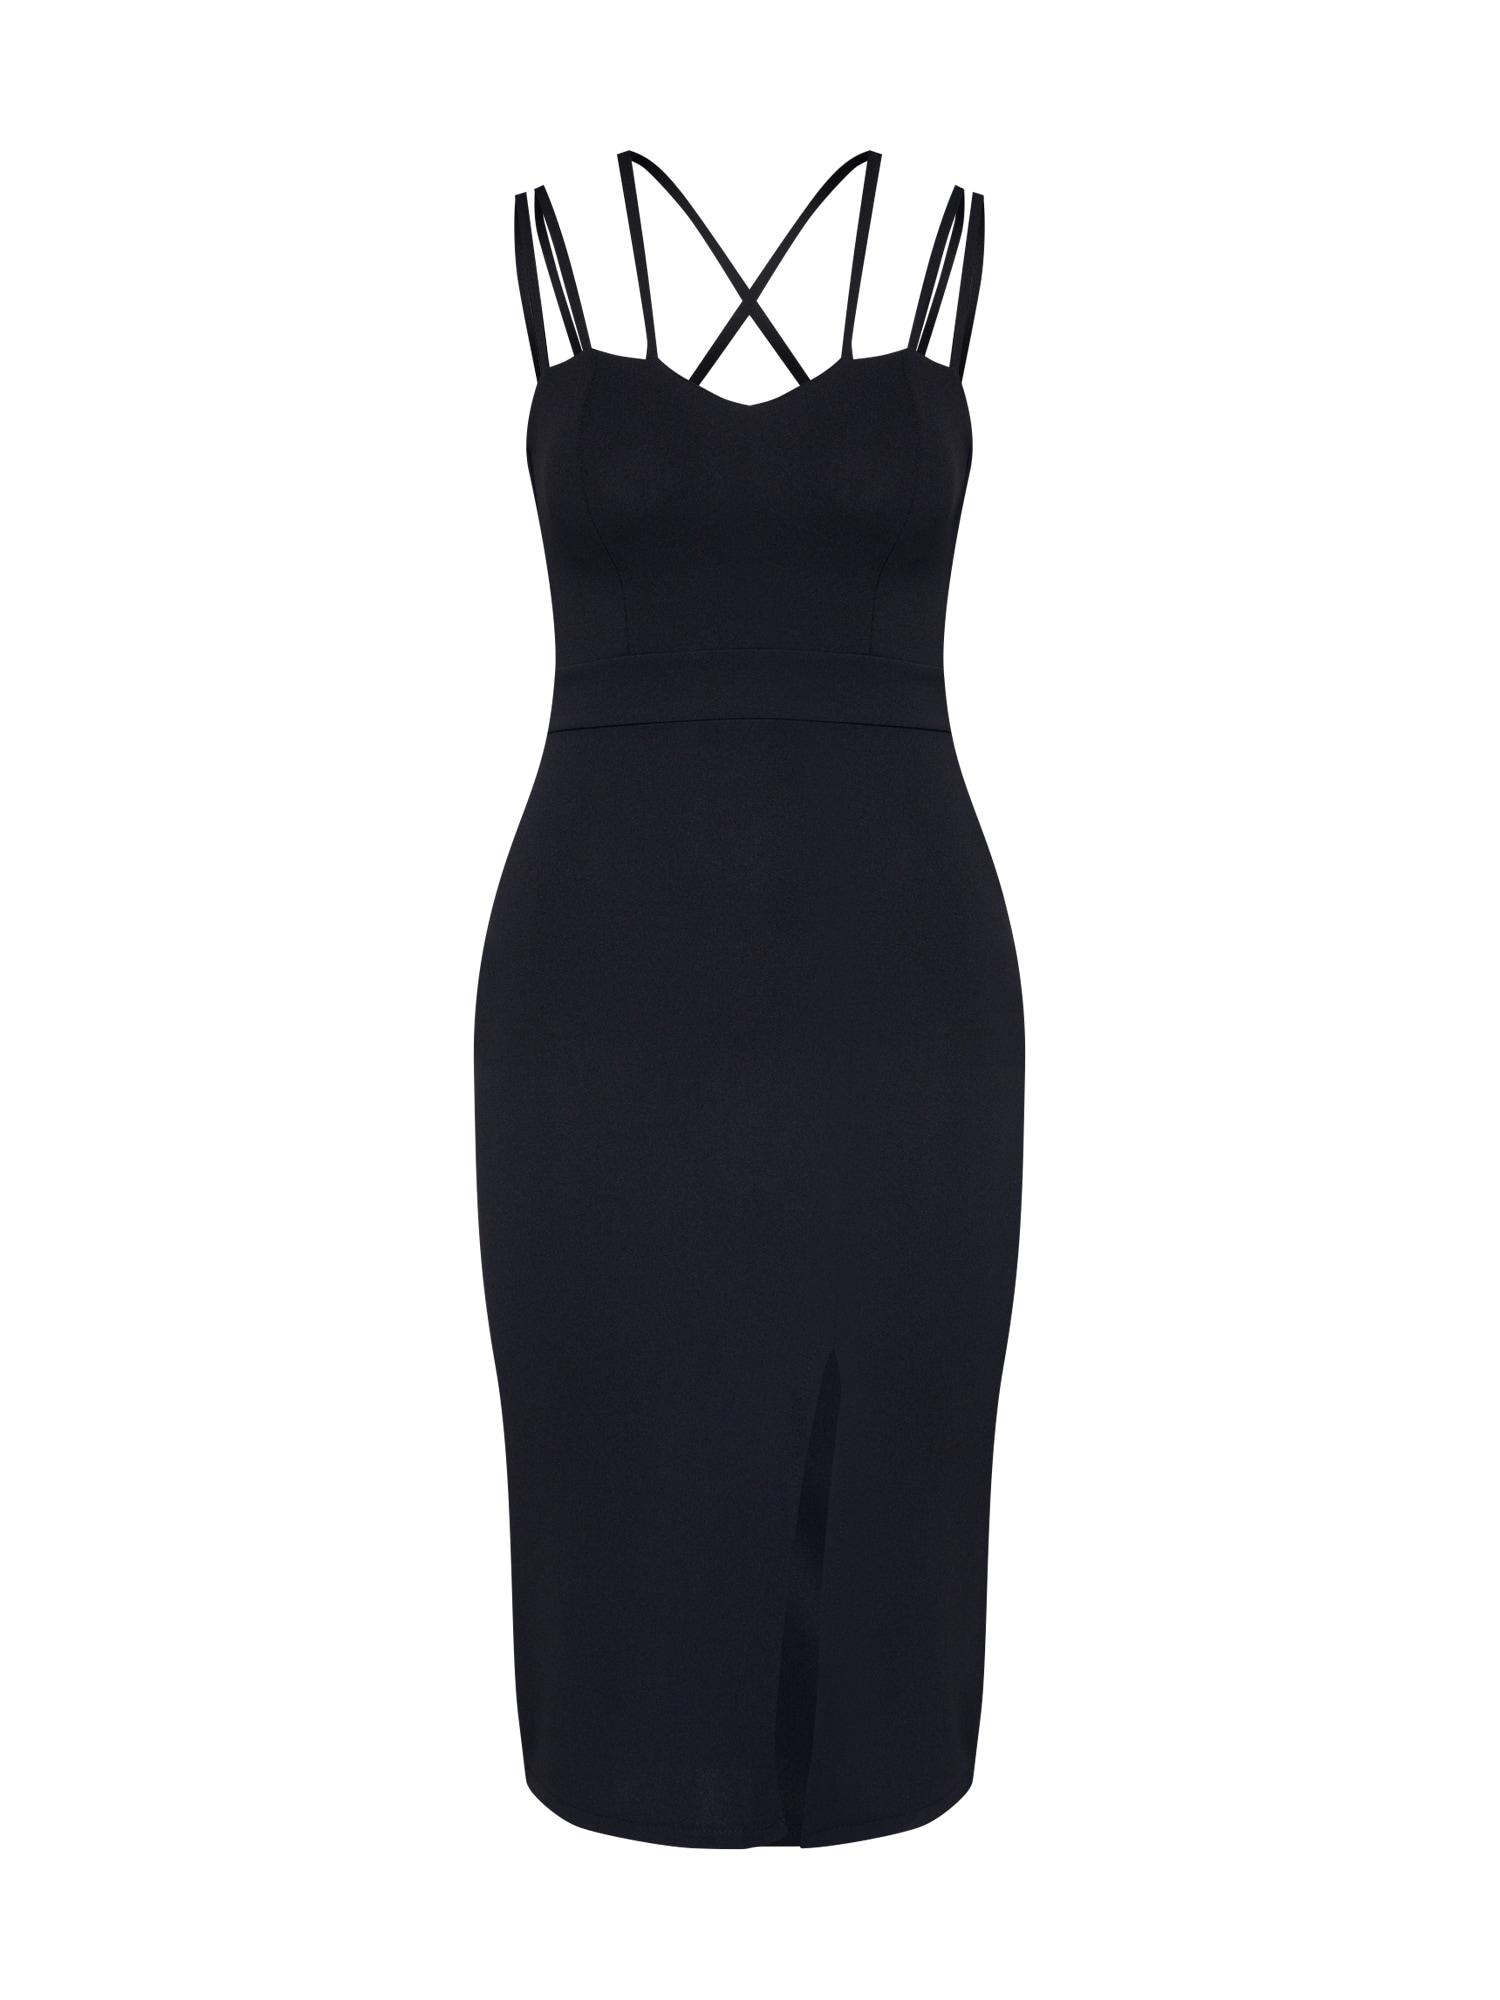 Pouzdrové šaty WG 8216 černá WAL G.